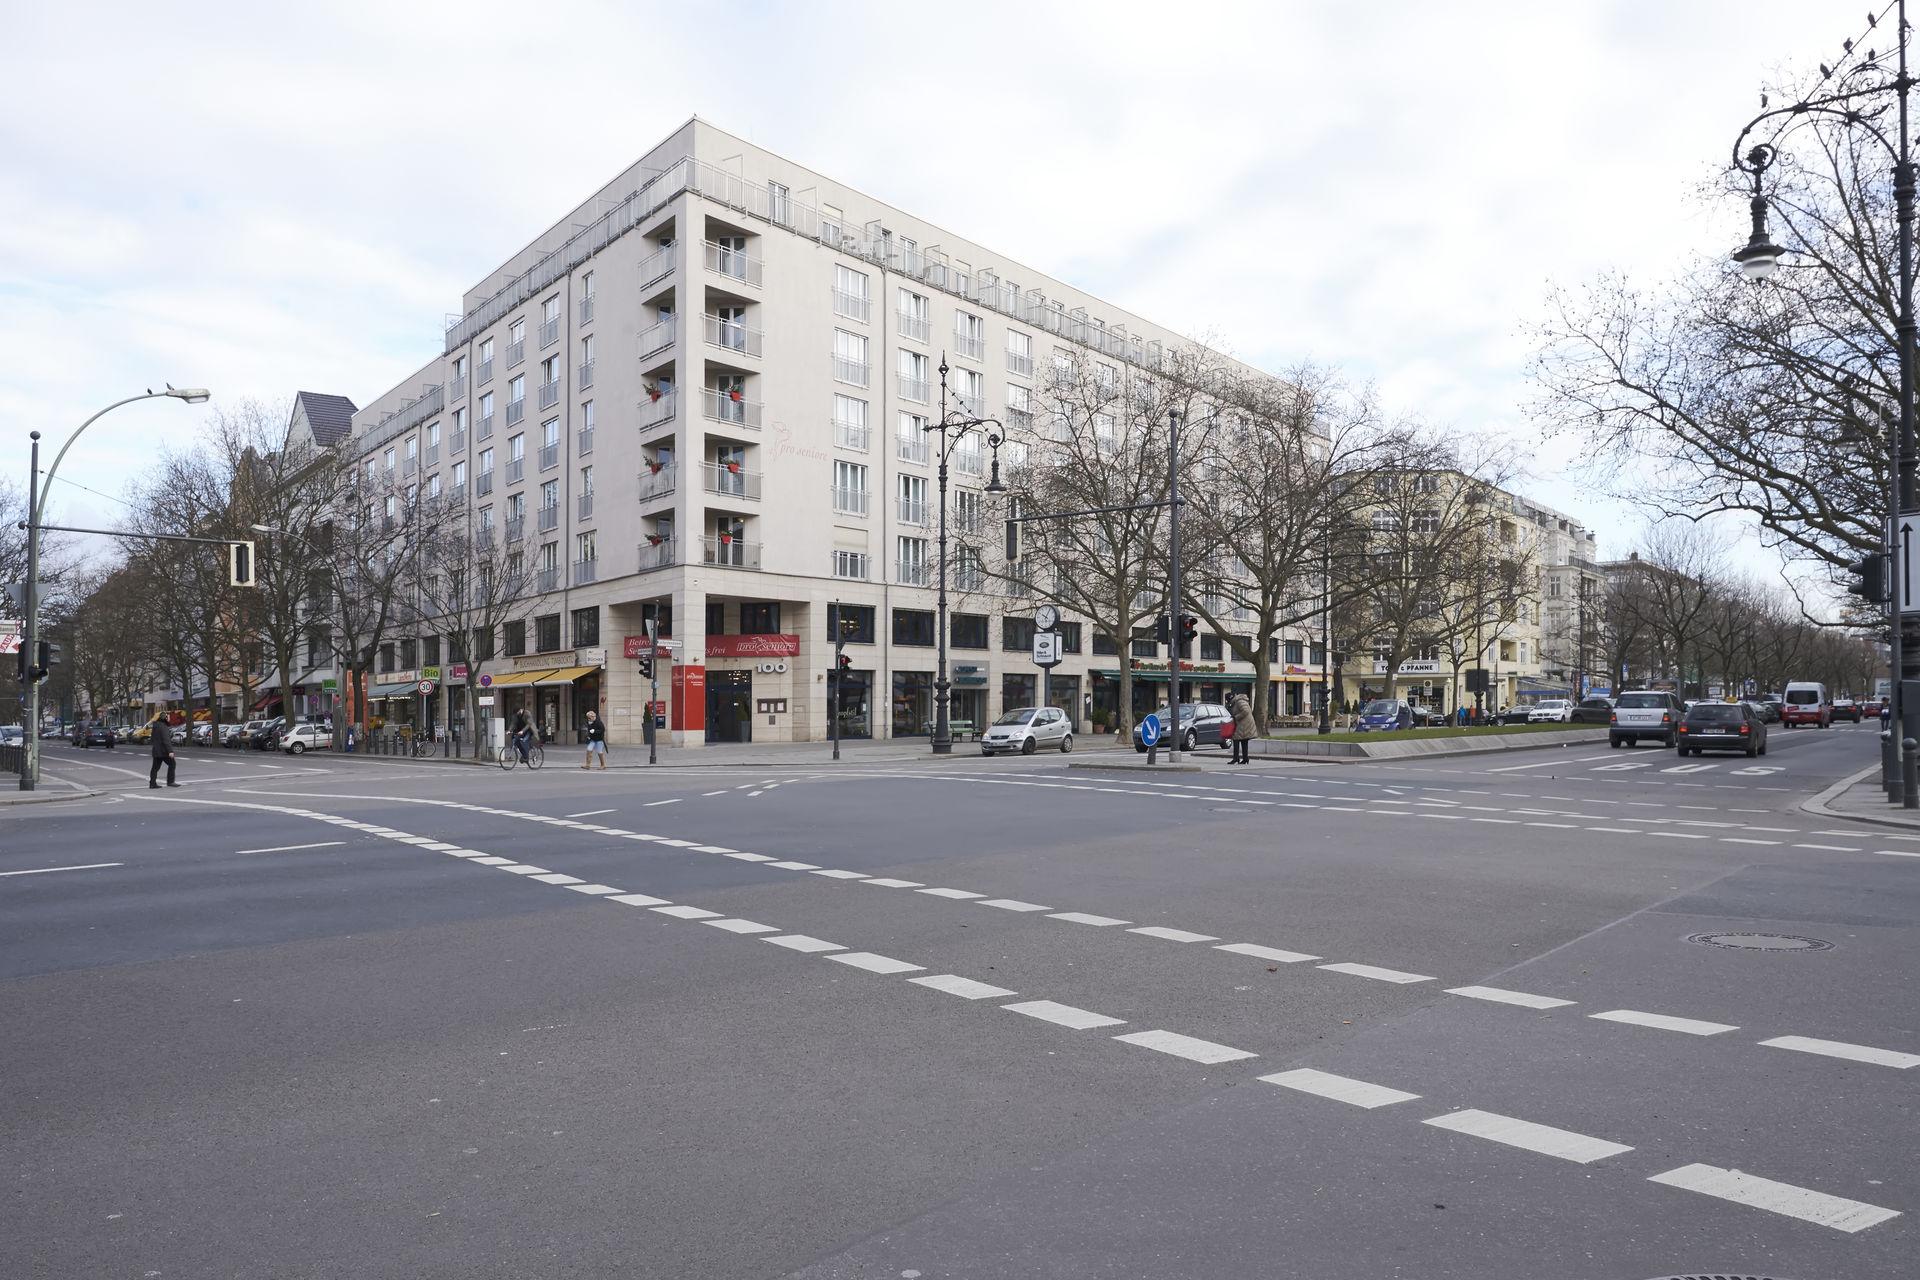 Stylishe Wohnung in Berlin Charlottenburg